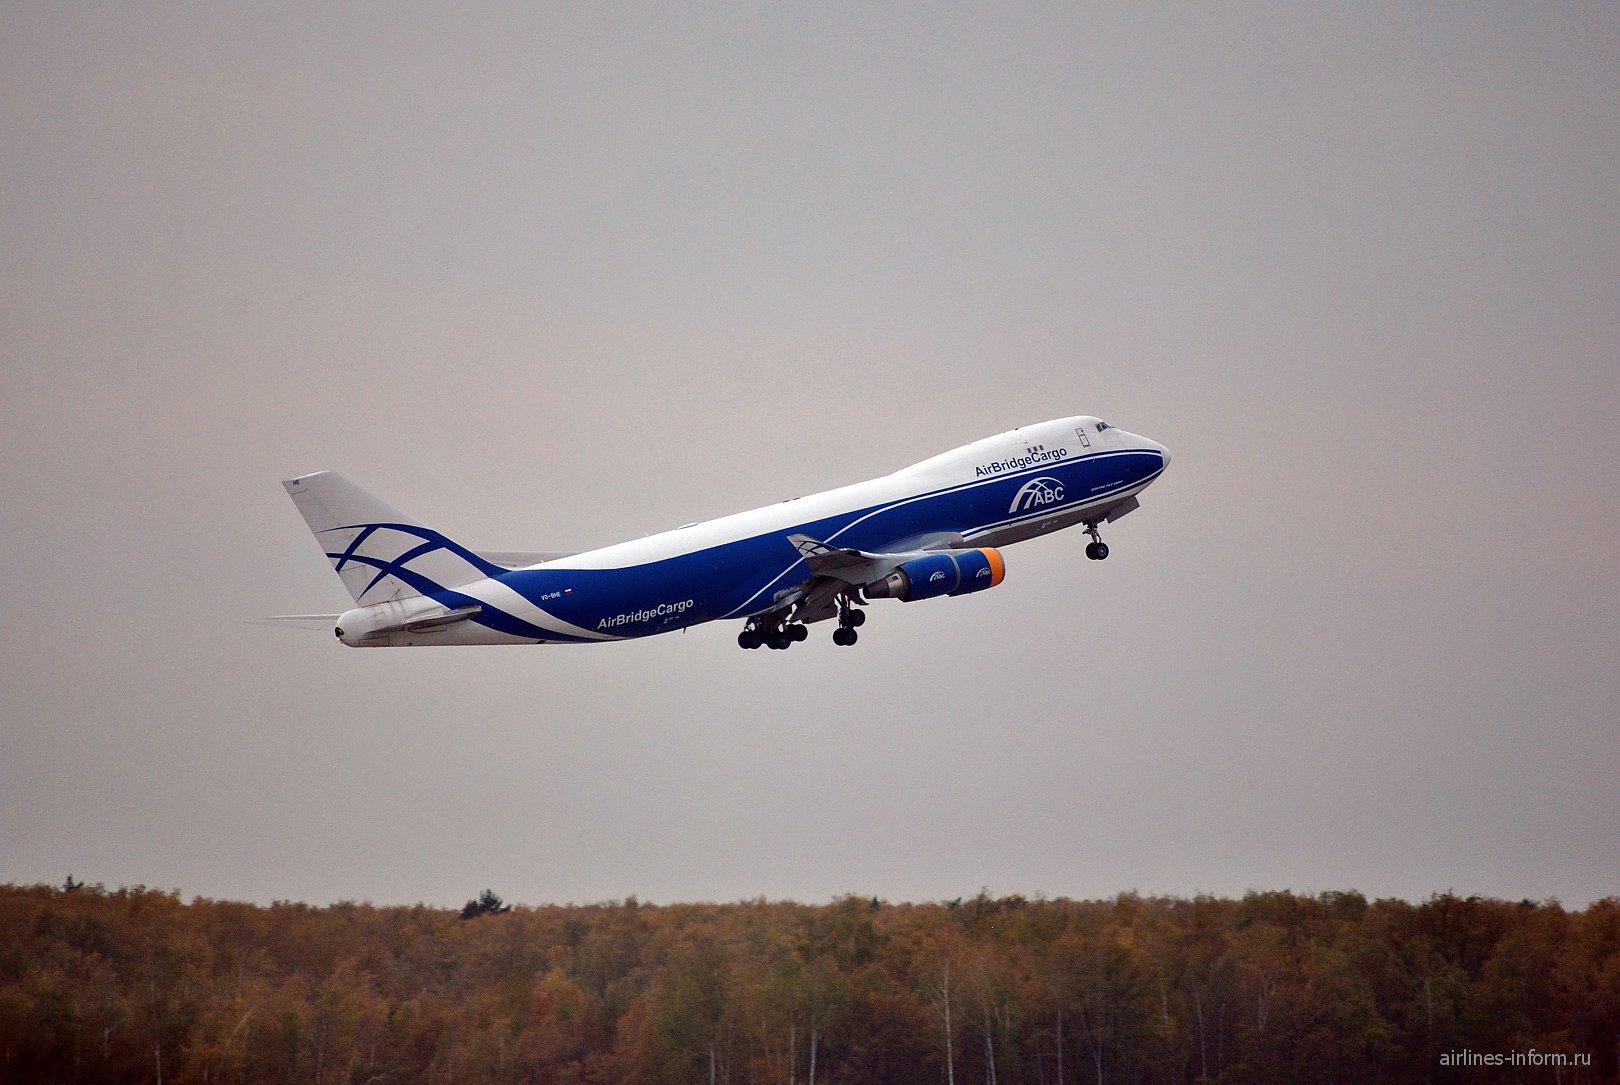 Взлет грузового самолета Боинг-747-400 авиакомпании Air Bridge Cargo